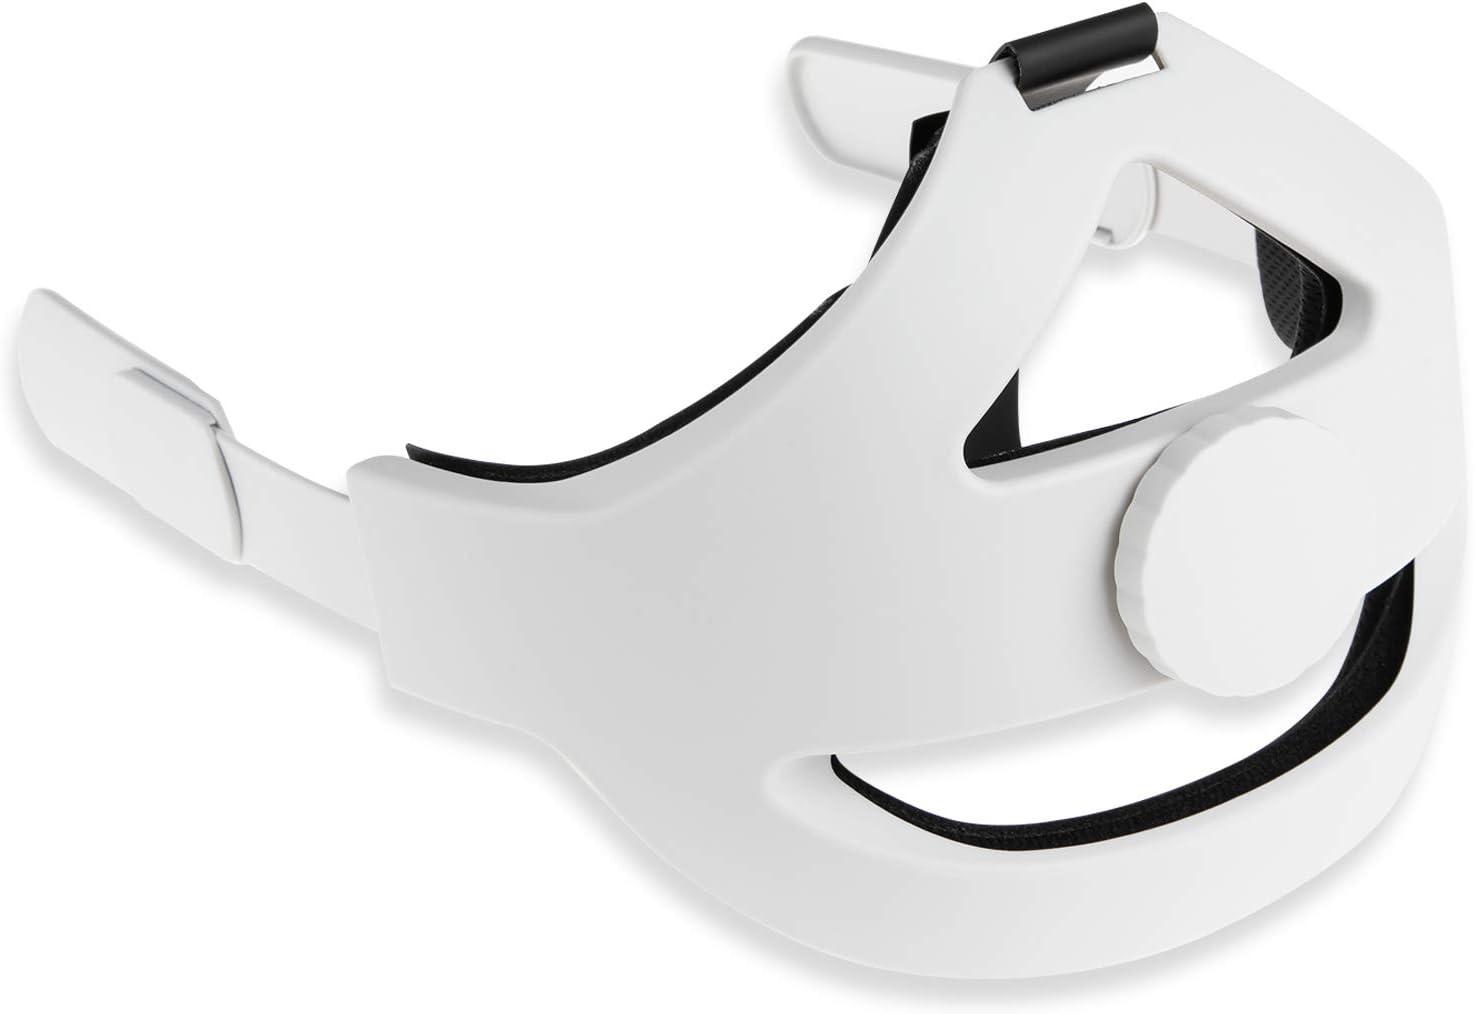 Orzero Oculus Quest 2 Head Strap- White $35.99 Coupon